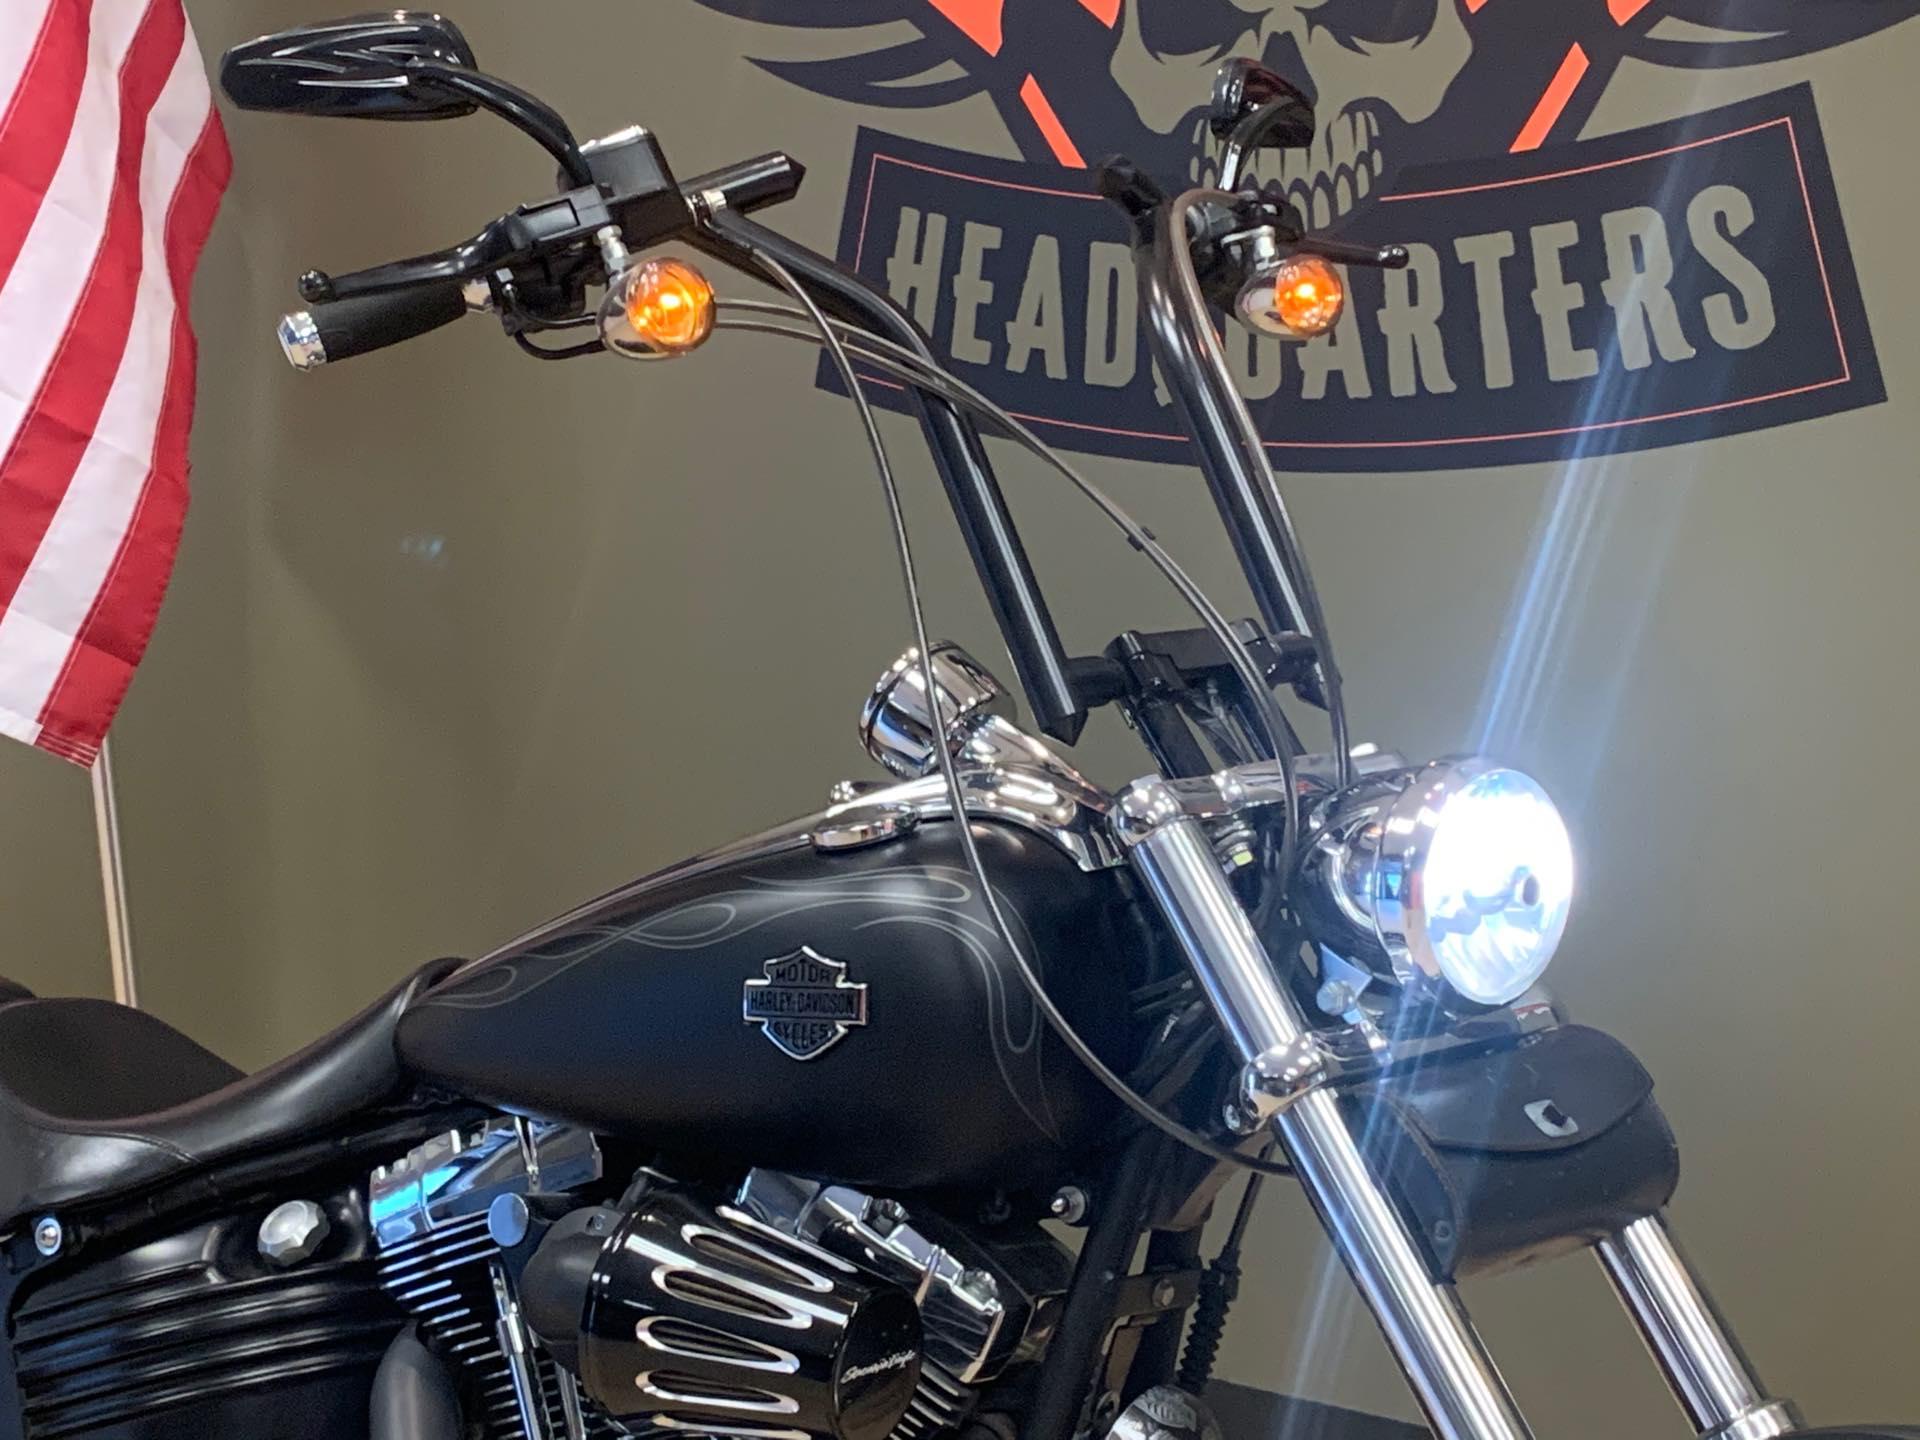 2010 Harley-Davidson Softail Rocker C at Loess Hills Harley-Davidson